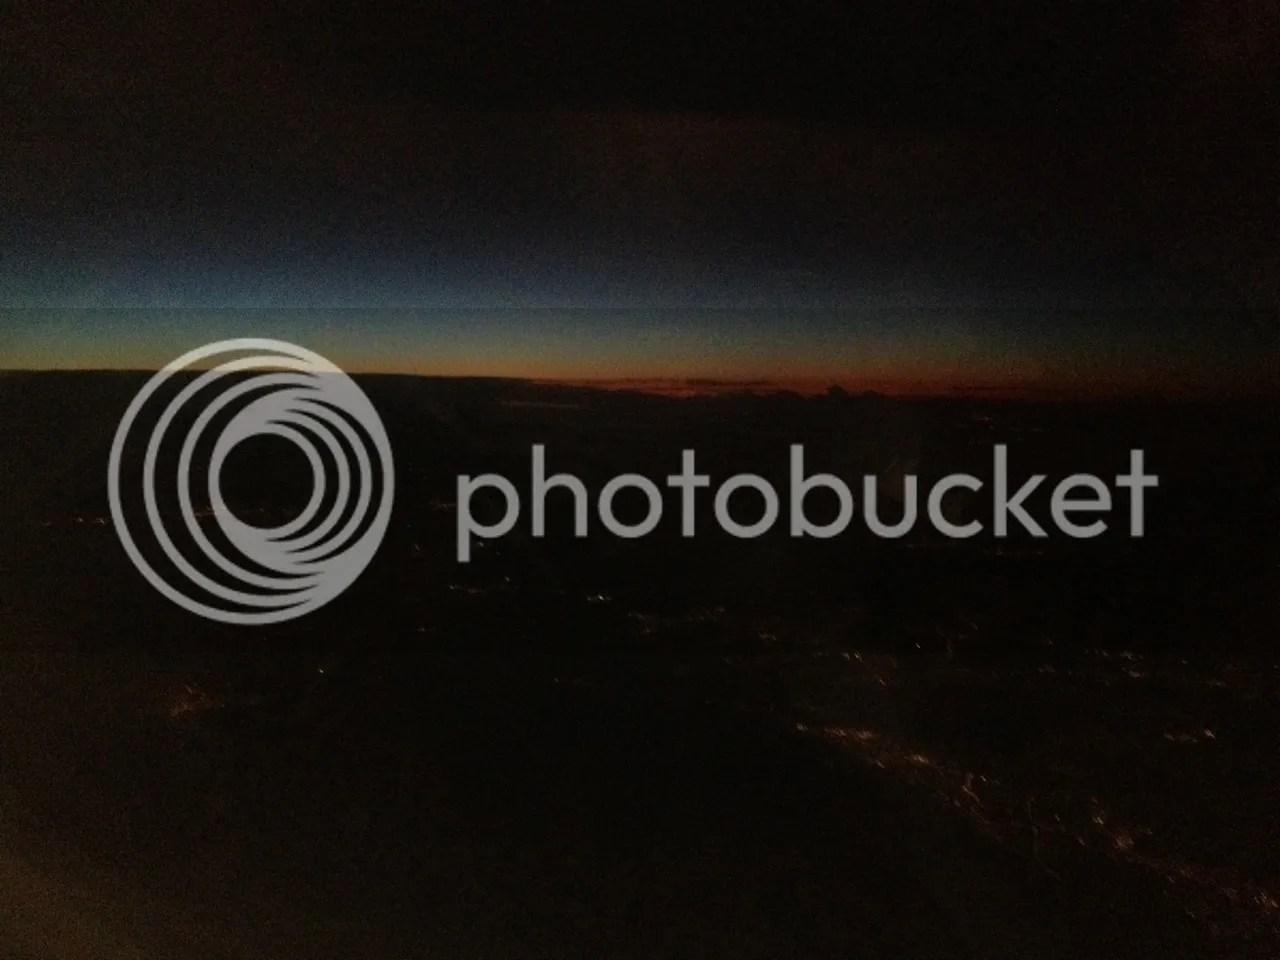 https://i0.wp.com/i181.photobucket.com/albums/x35/jwhite9185/Madrid/file-82.jpg